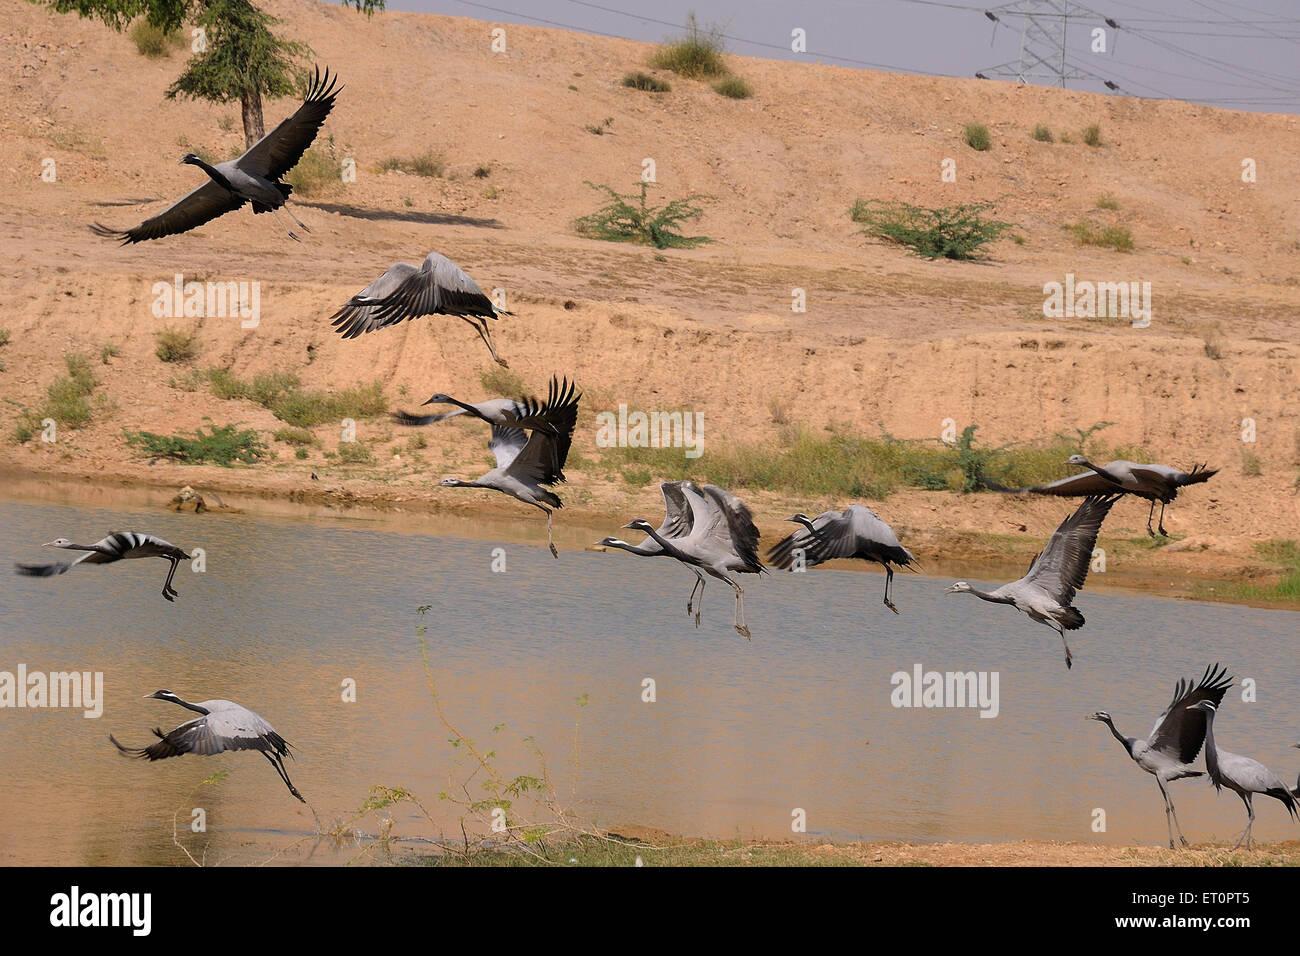 Birds ; cranes flying near pond ; Jodhpur ; Rajasthan ; India - Stock Image